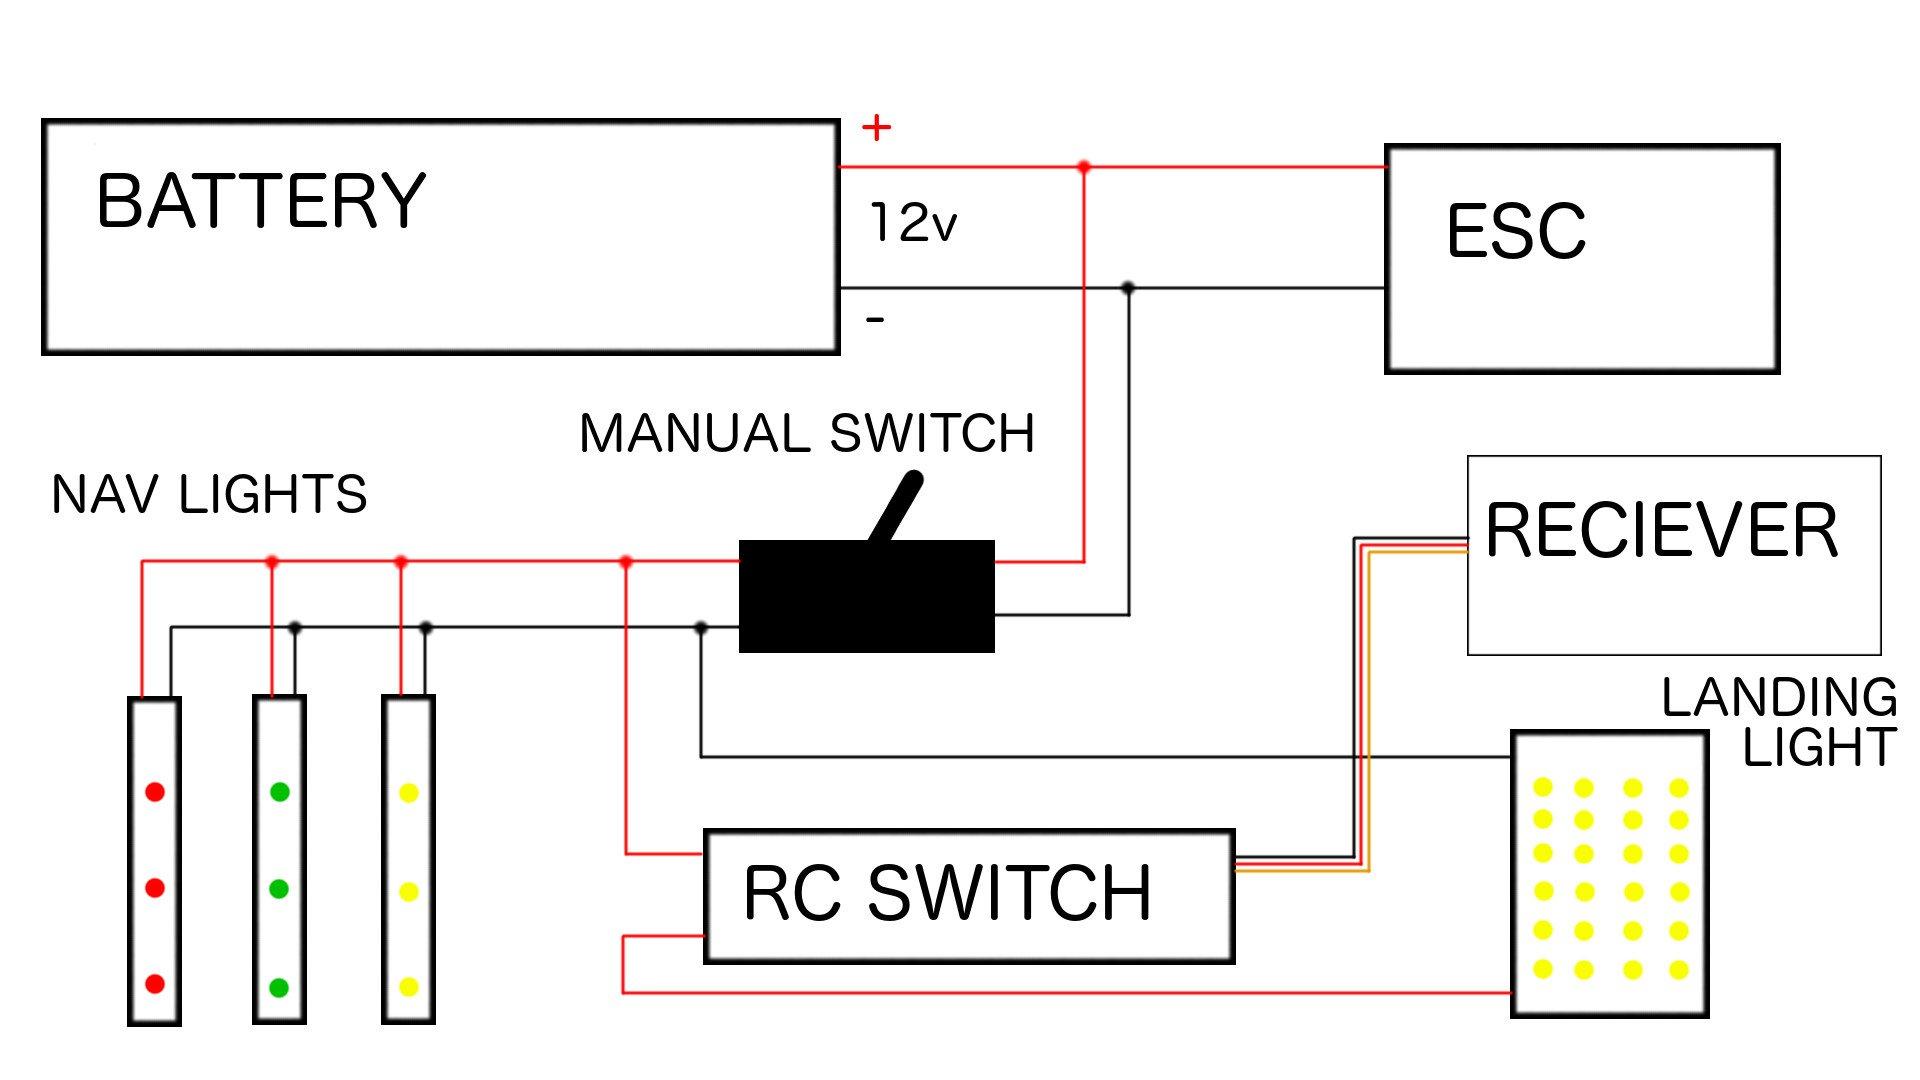 Landing light wiring diagram wiring diagram winter swappables part 2 landing lights flite test grimes landing light wiring diagram landing light wiring diagram cheapraybanclubmaster Choice Image